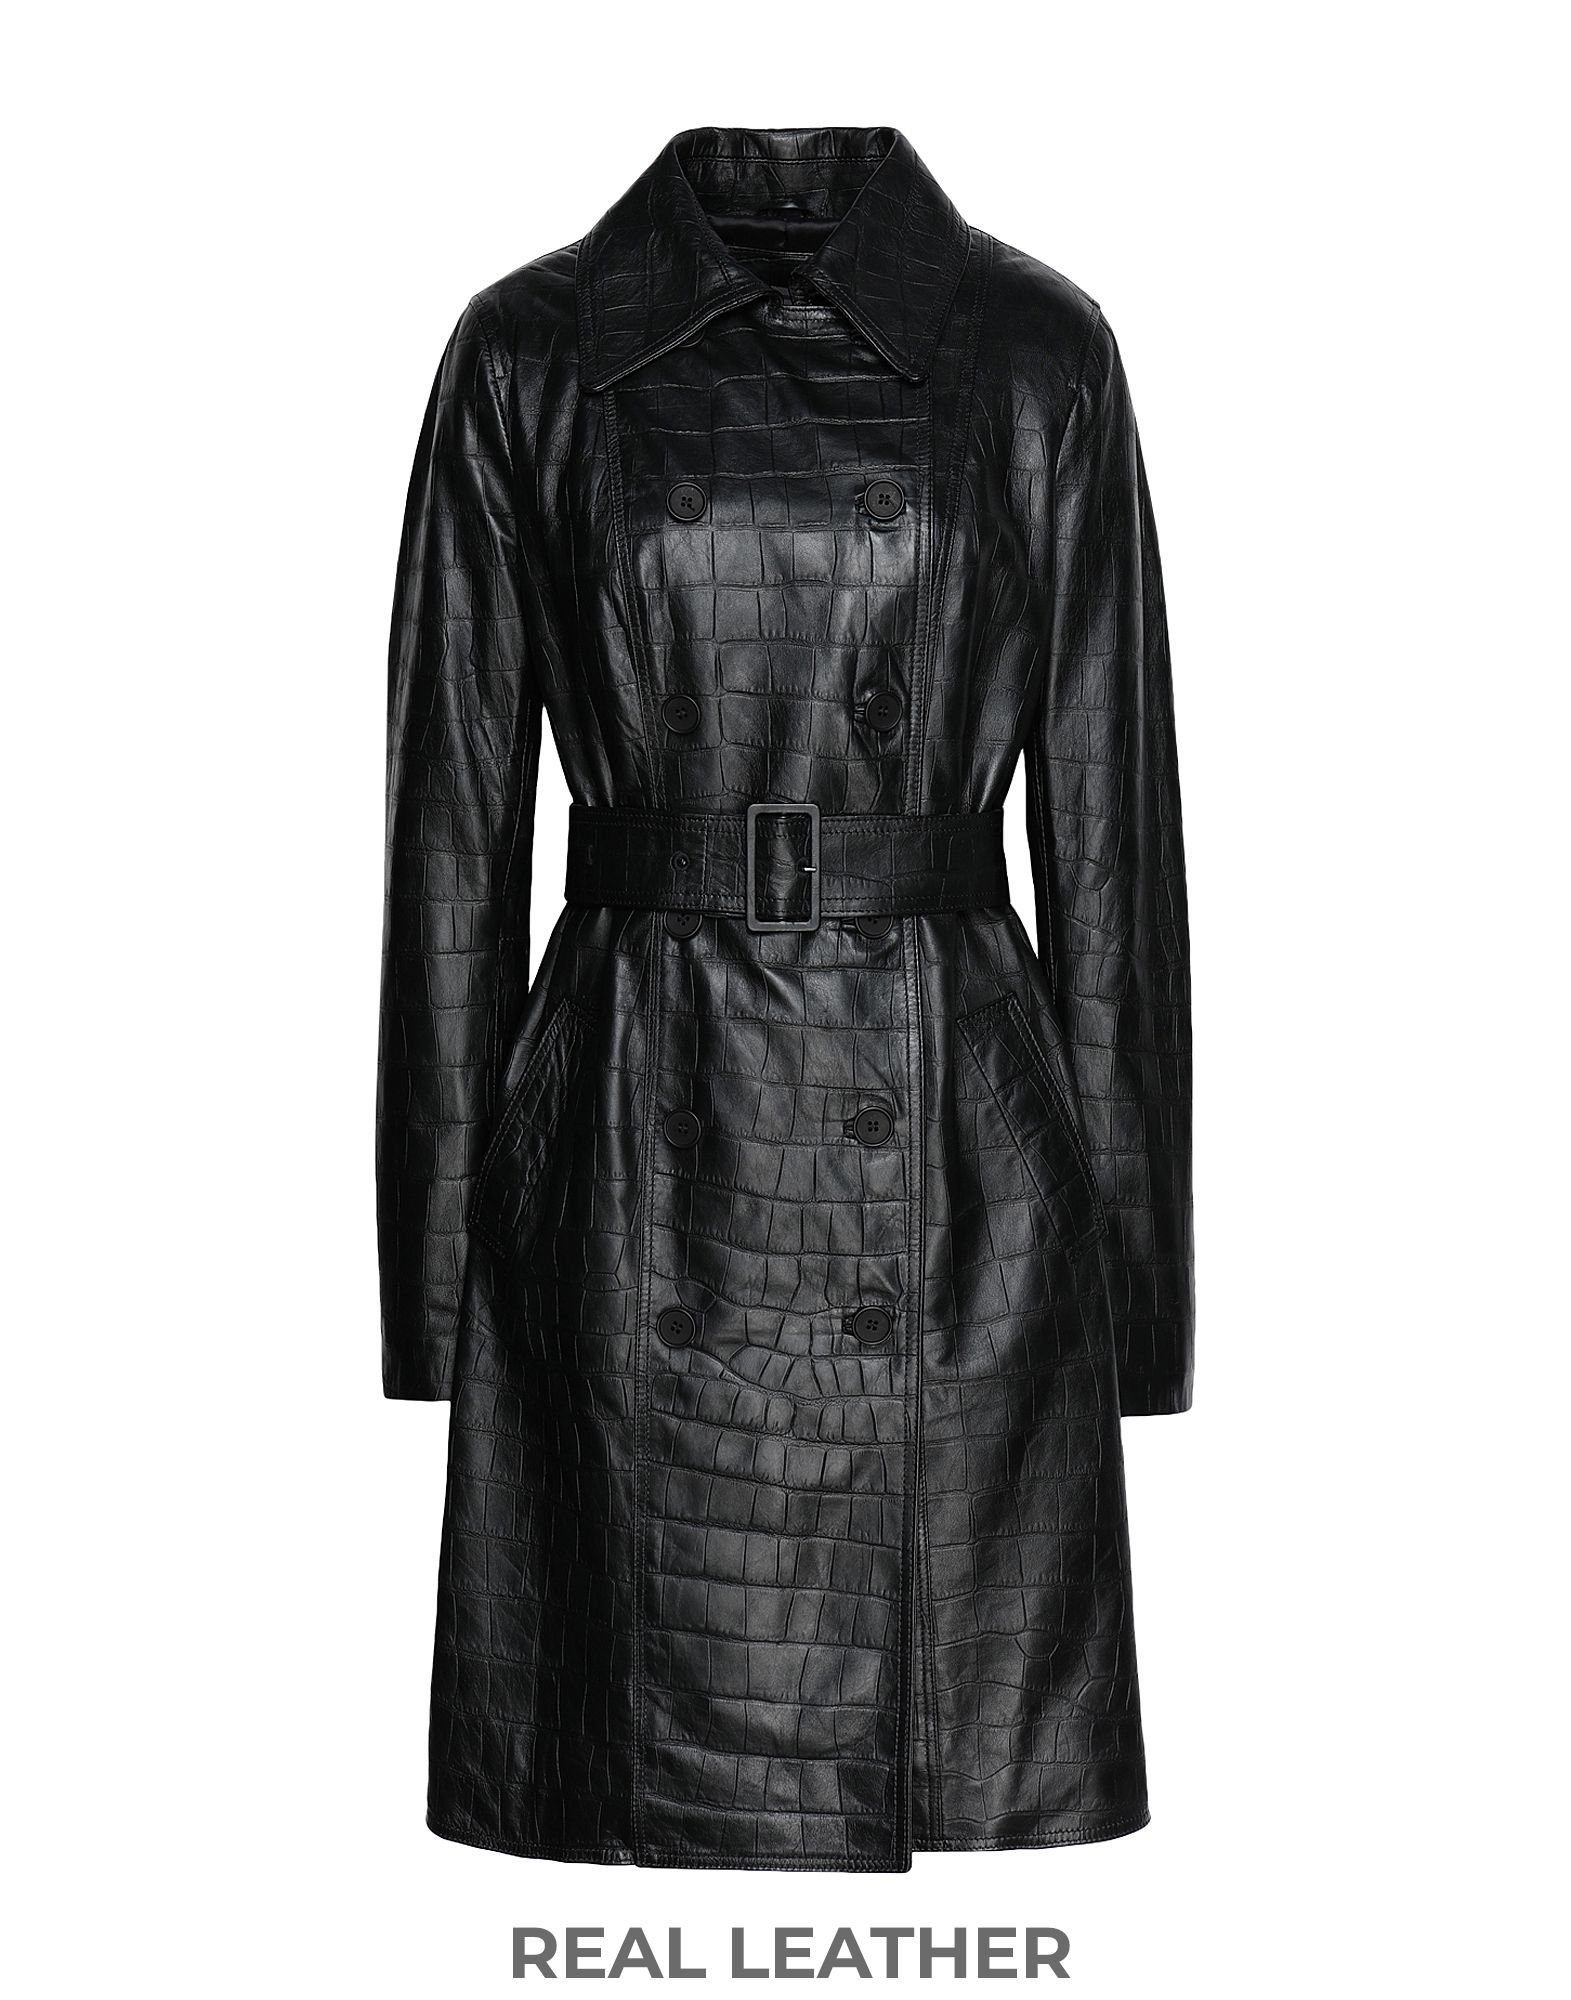 8 by YOOX Легкое пальто 8 by yoox легкое пальто